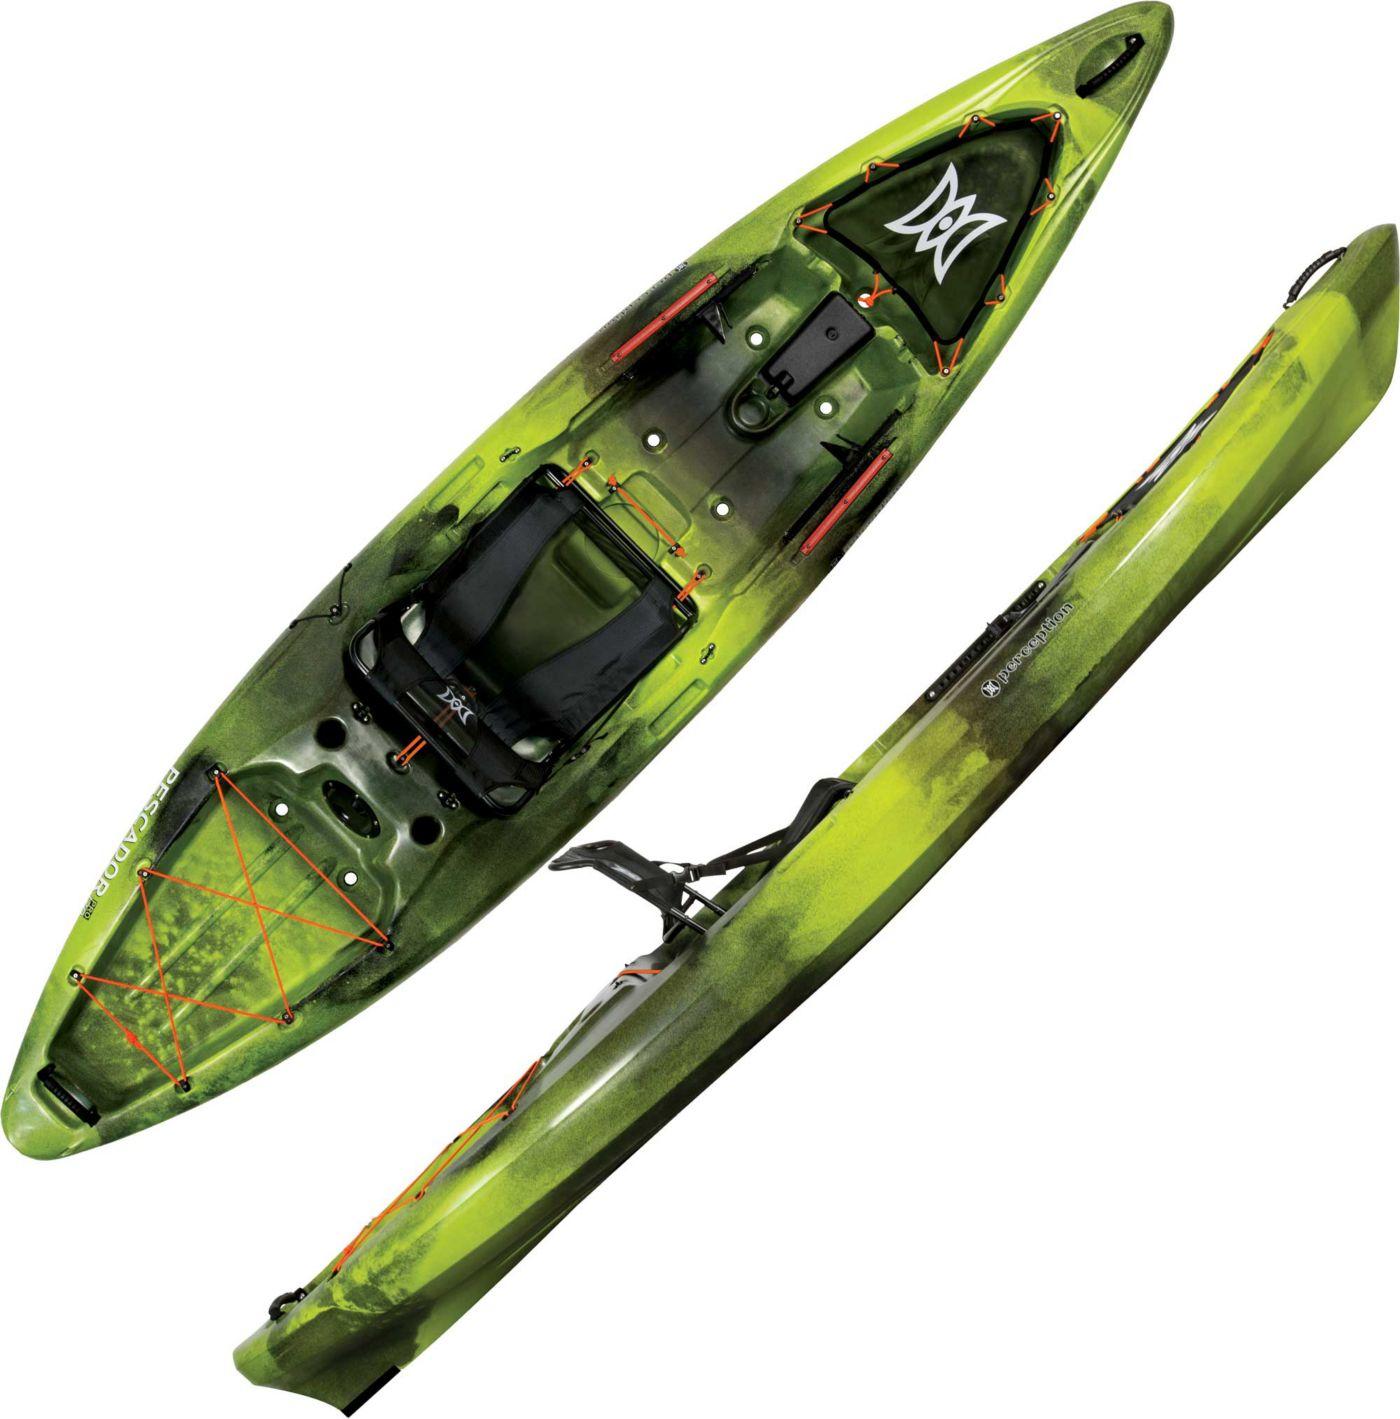 Perception Pescador Pro 12.0 Angler Kayak